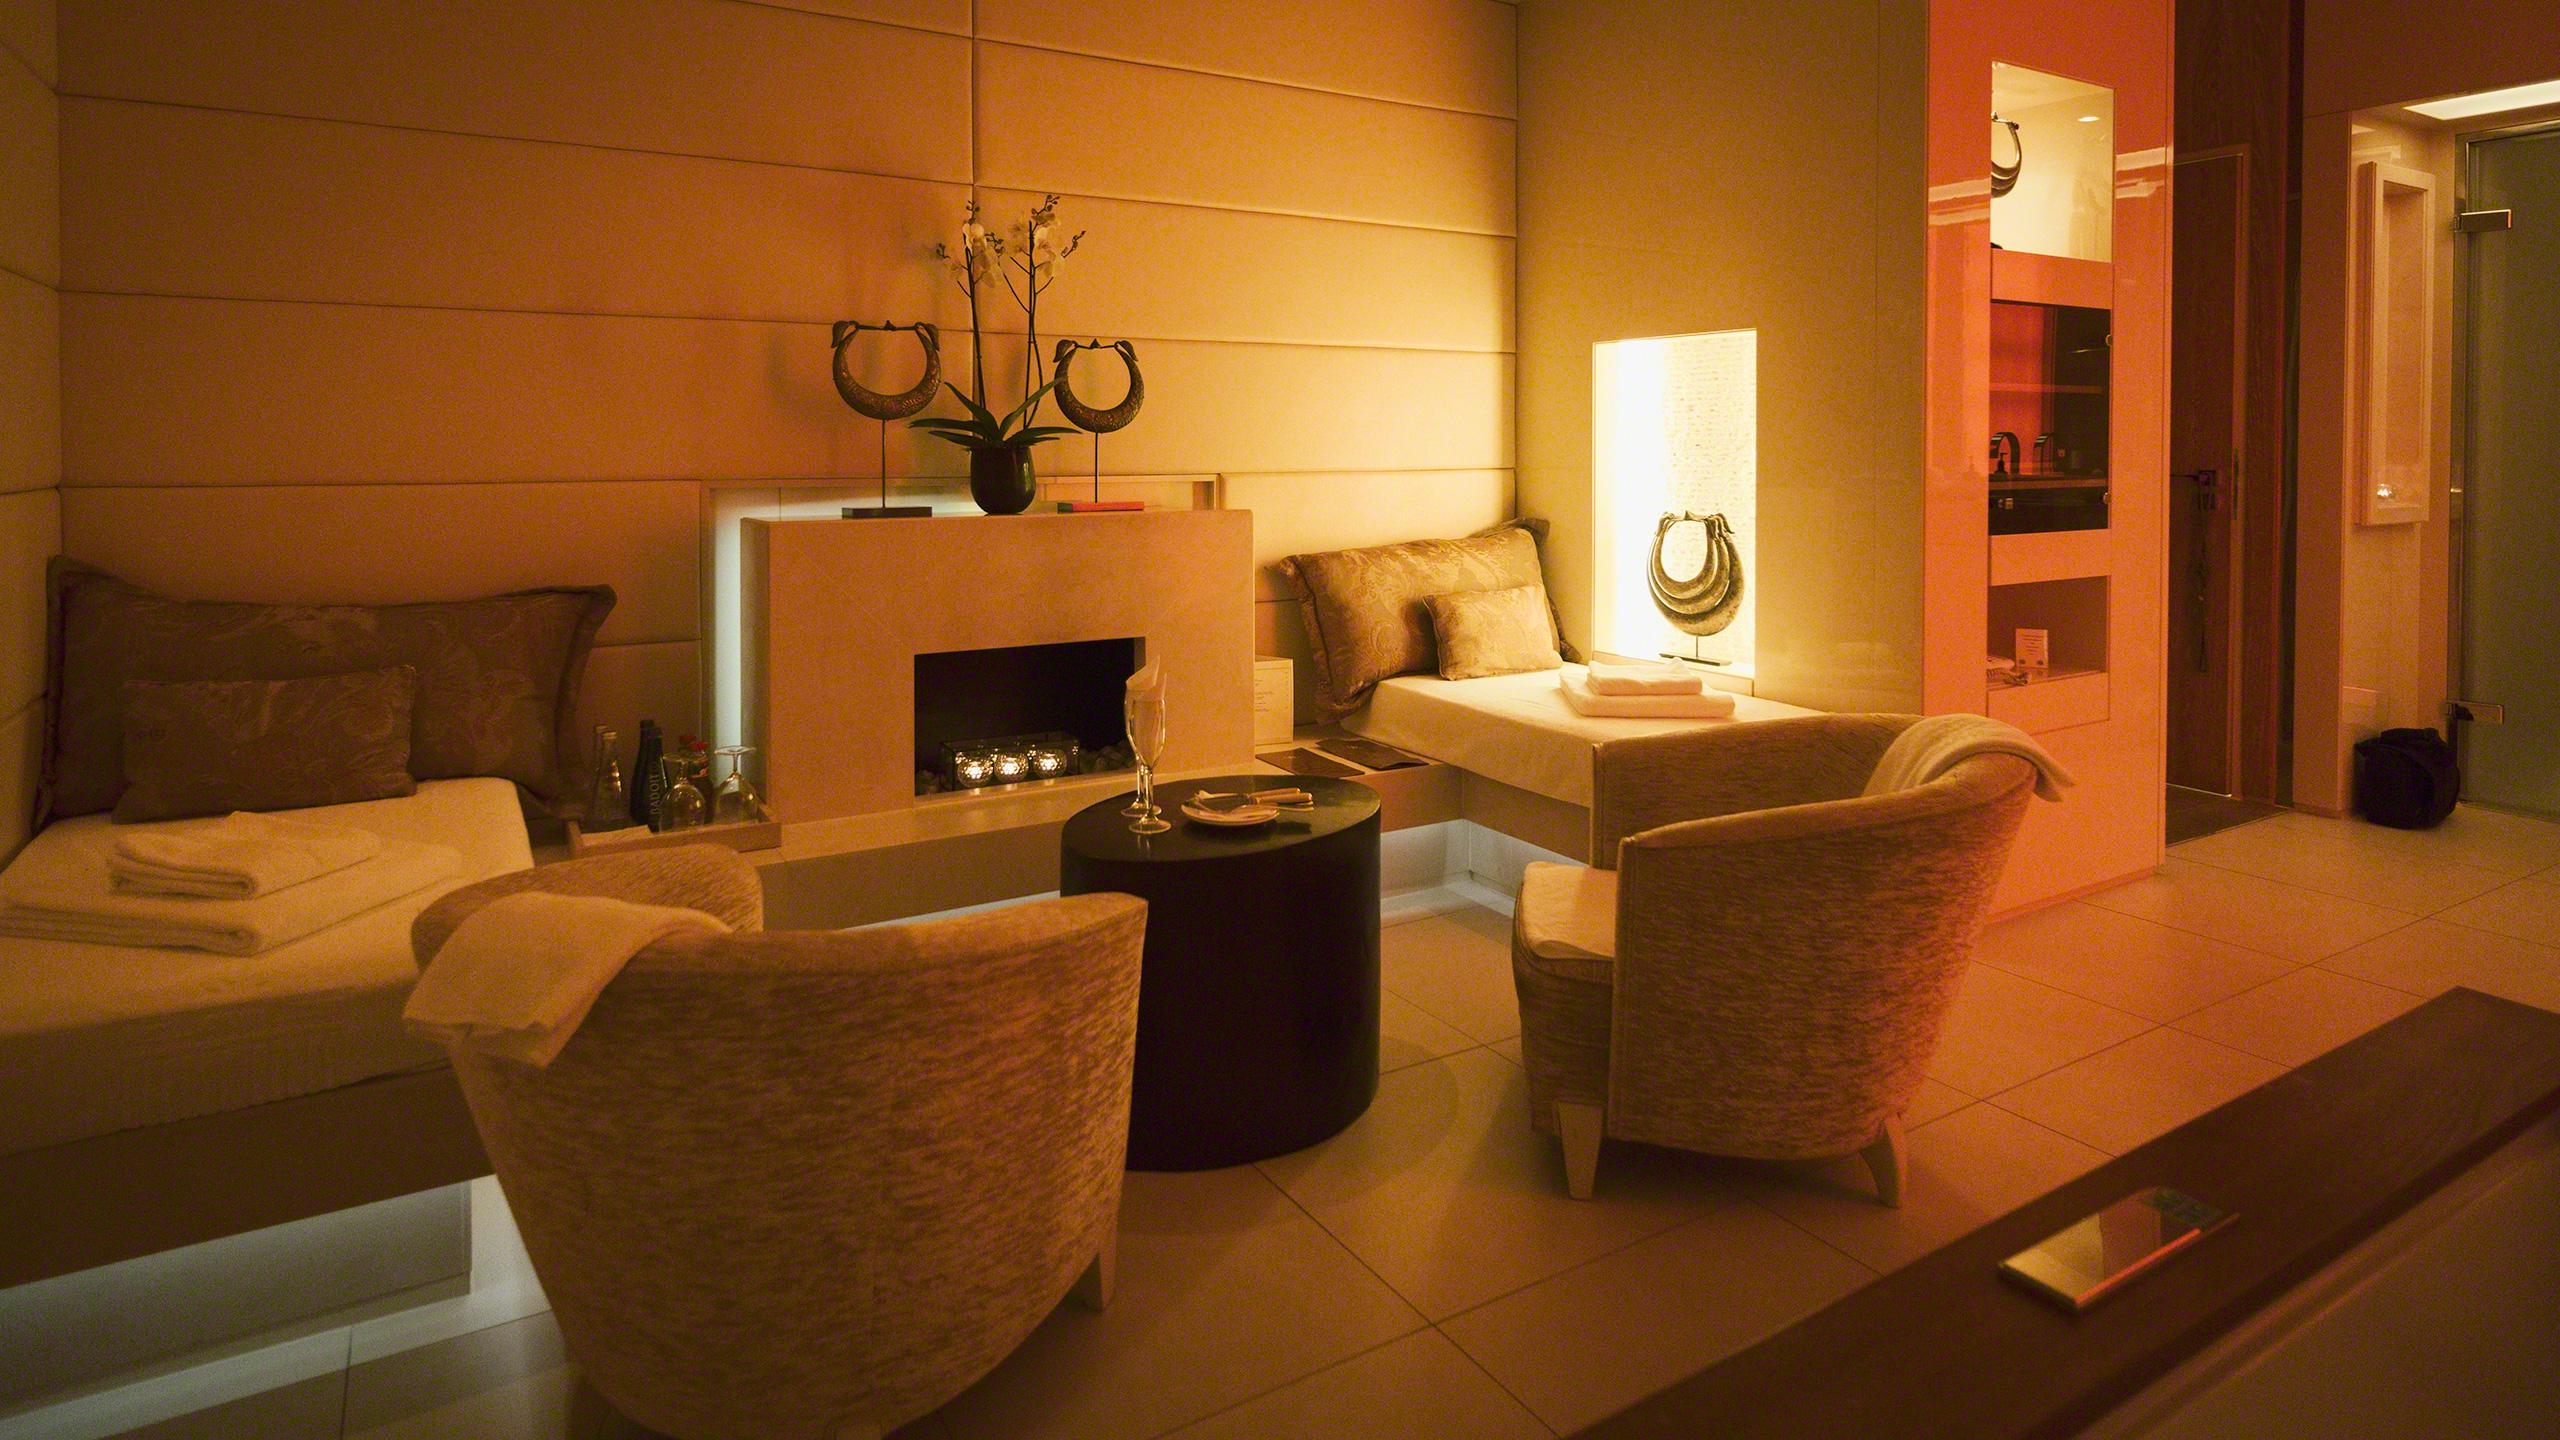 Luxushotel Adlon Kempinski Berlin Spa by Resense